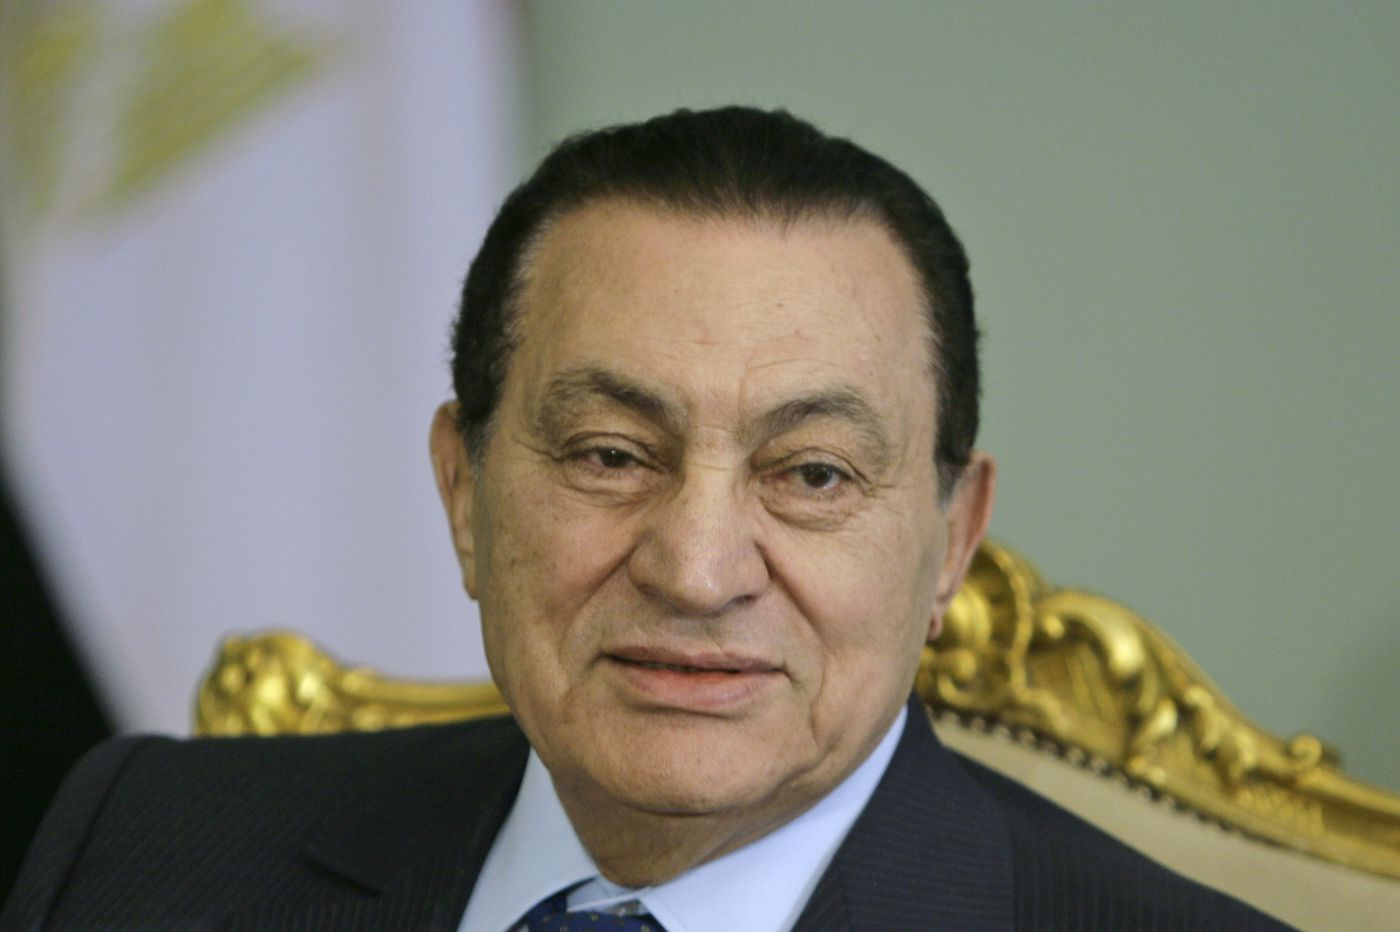 Hosni Mubarak, Egypt's autocrat ousted in uprising, dies at 91